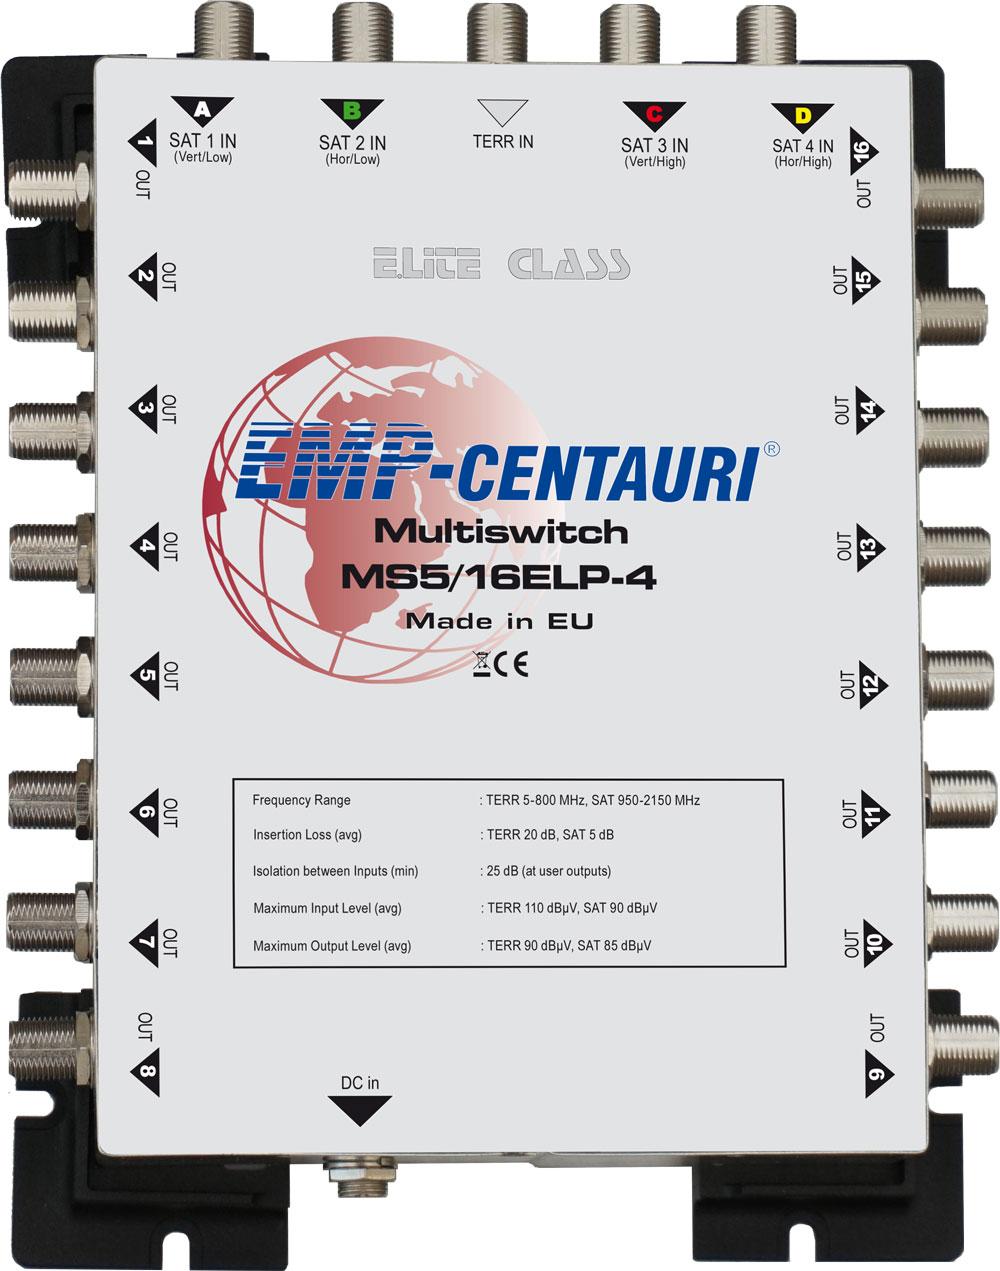 EMP-Centauri E.Lite Class MS 5/16 ELP-4 Multiswitch Multischalter Matrix Sat Verteiler 4K FullHD UHD